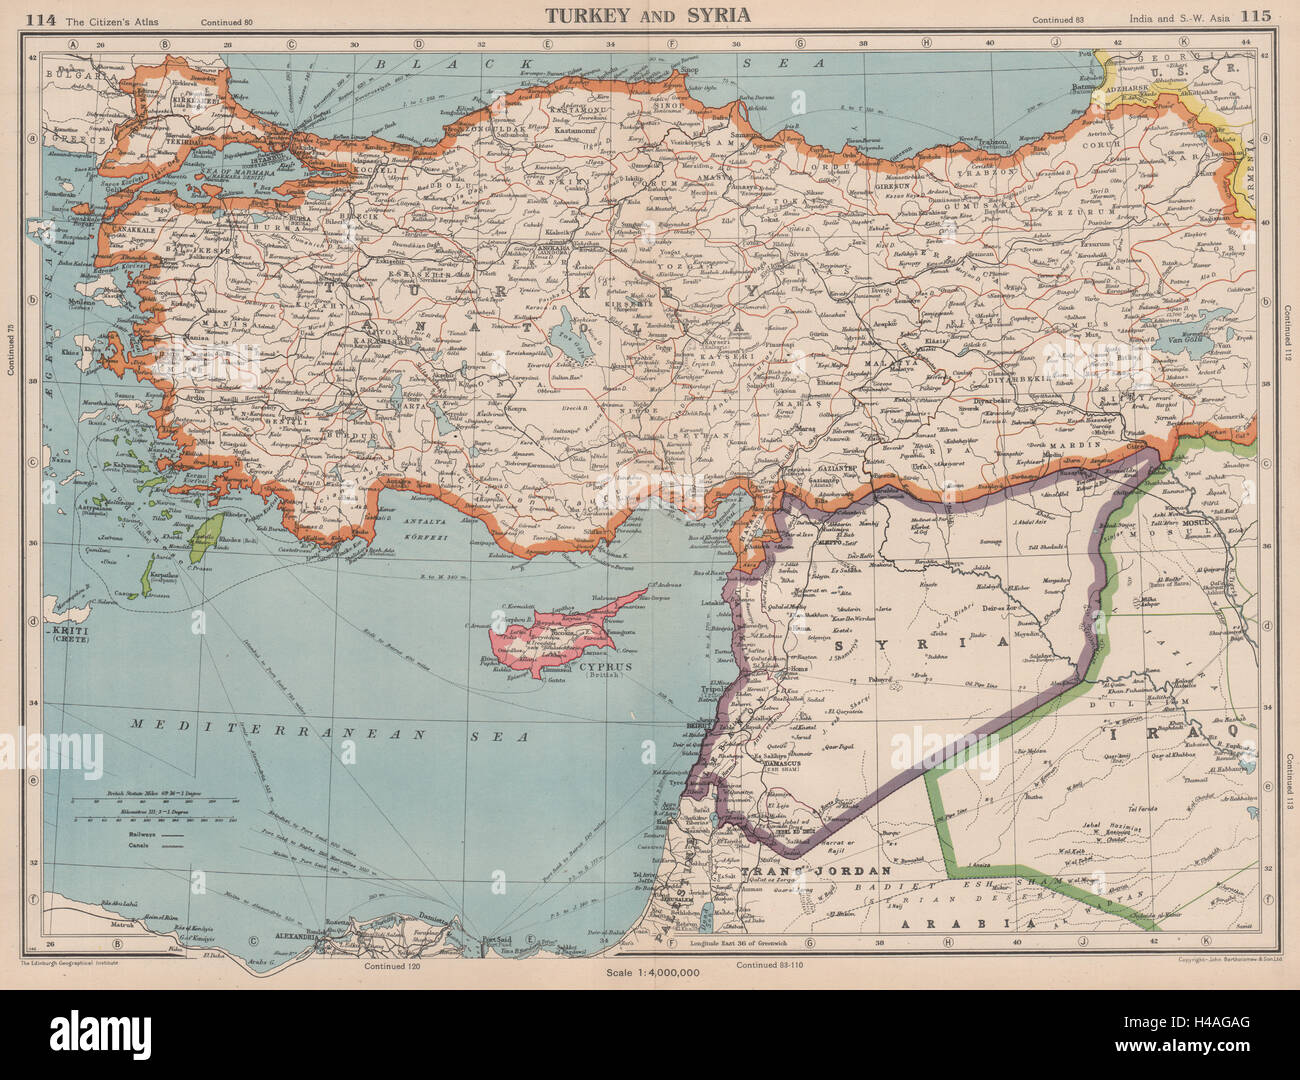 Turkey levant syria incorporates lebanon palestine predates turkey levant syria incorporates lebanon palestine predates israel 1944 map gumiabroncs Image collections